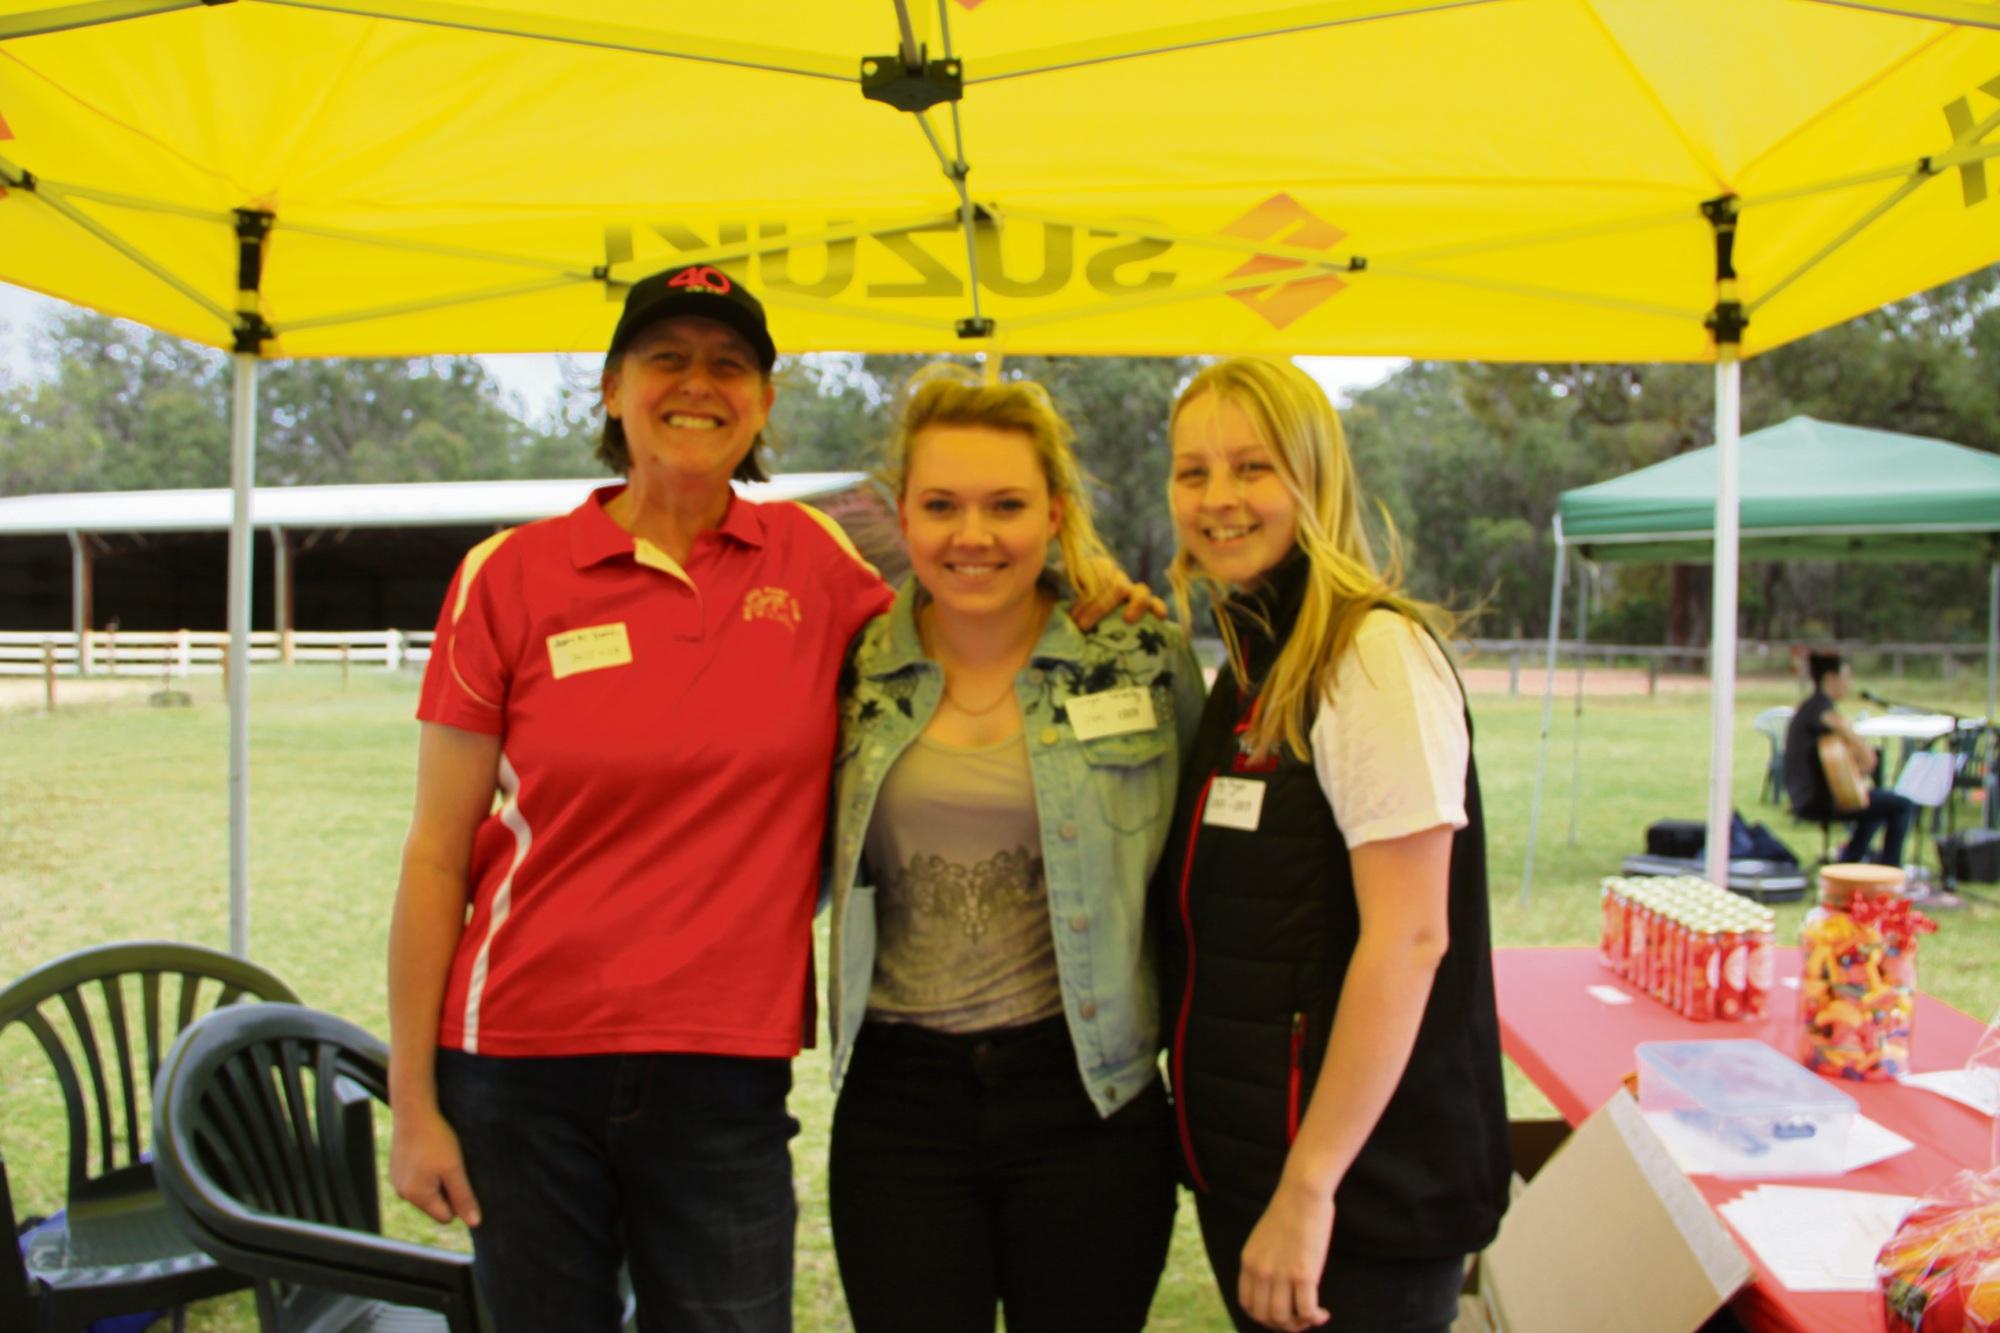 Janette Hatch, Imogen Calverley and Ally Fryer.